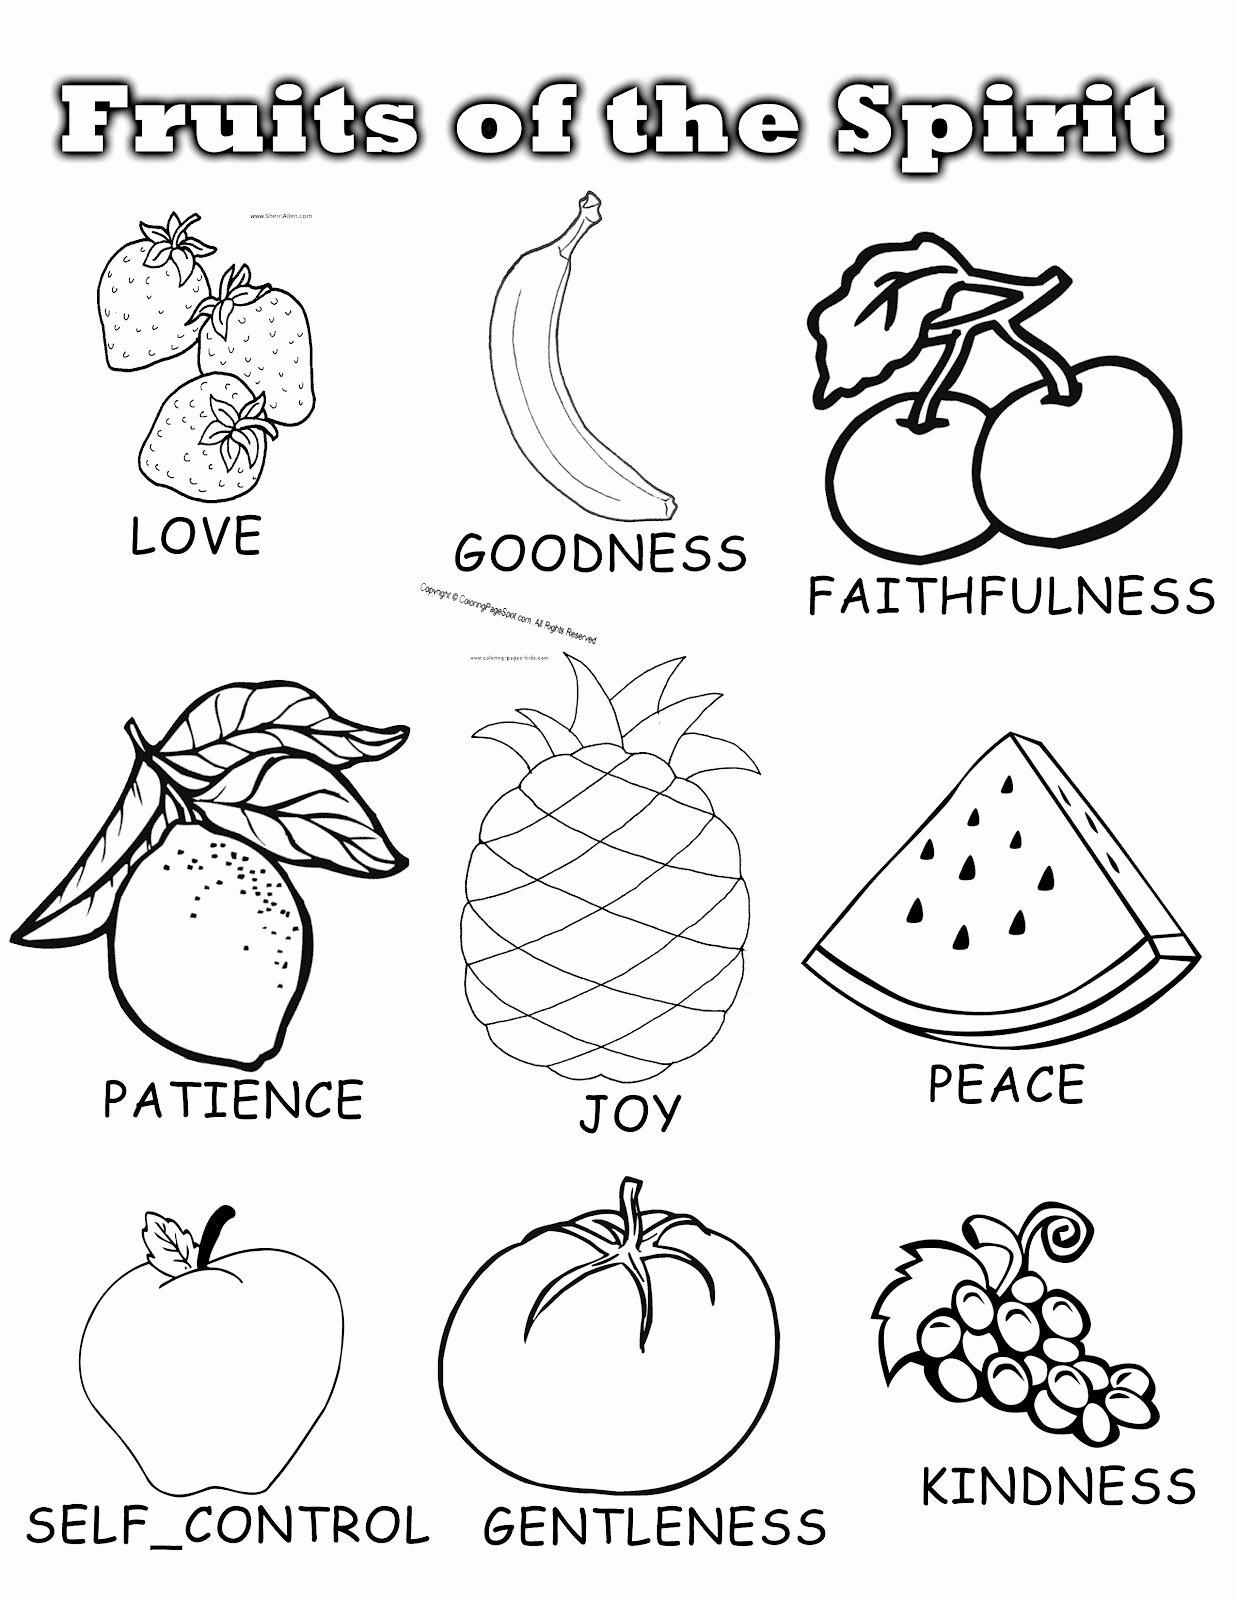 Fruits Of the Spirit Worksheet Inspirational Fruits the Spirit Sunday School Unit Coloring Fruit